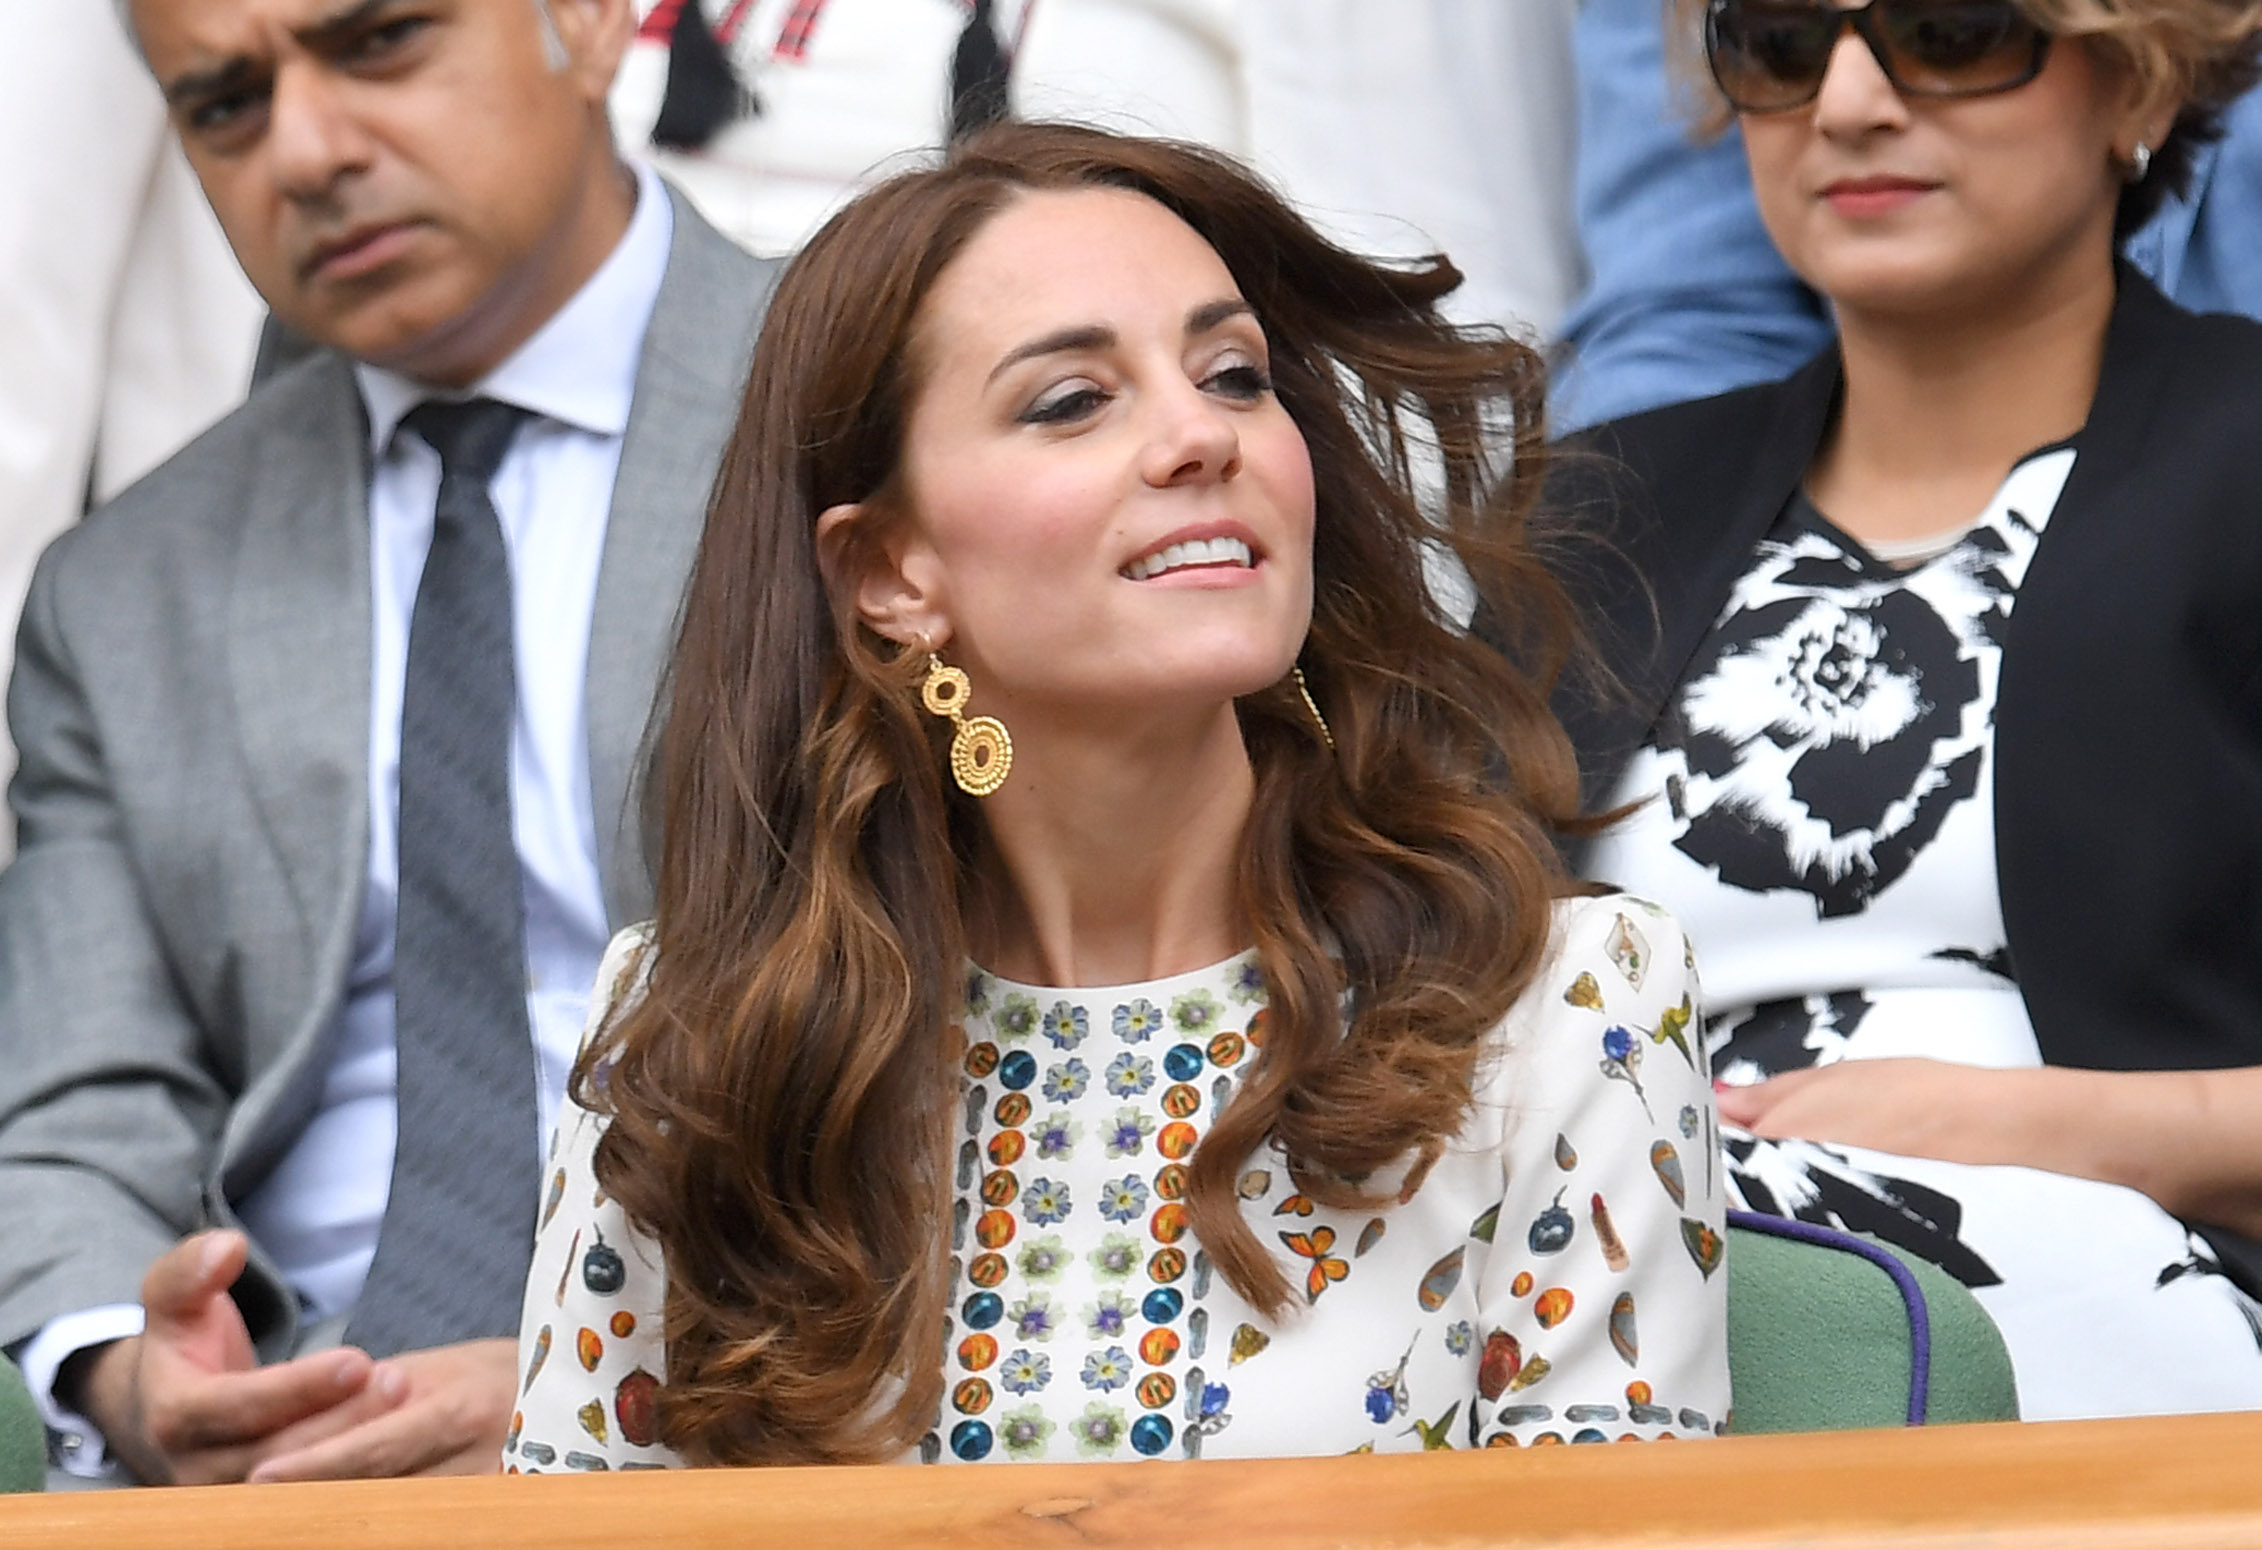 Kate Middleton, Duchess of Cambridge, at Wimbledon 2016